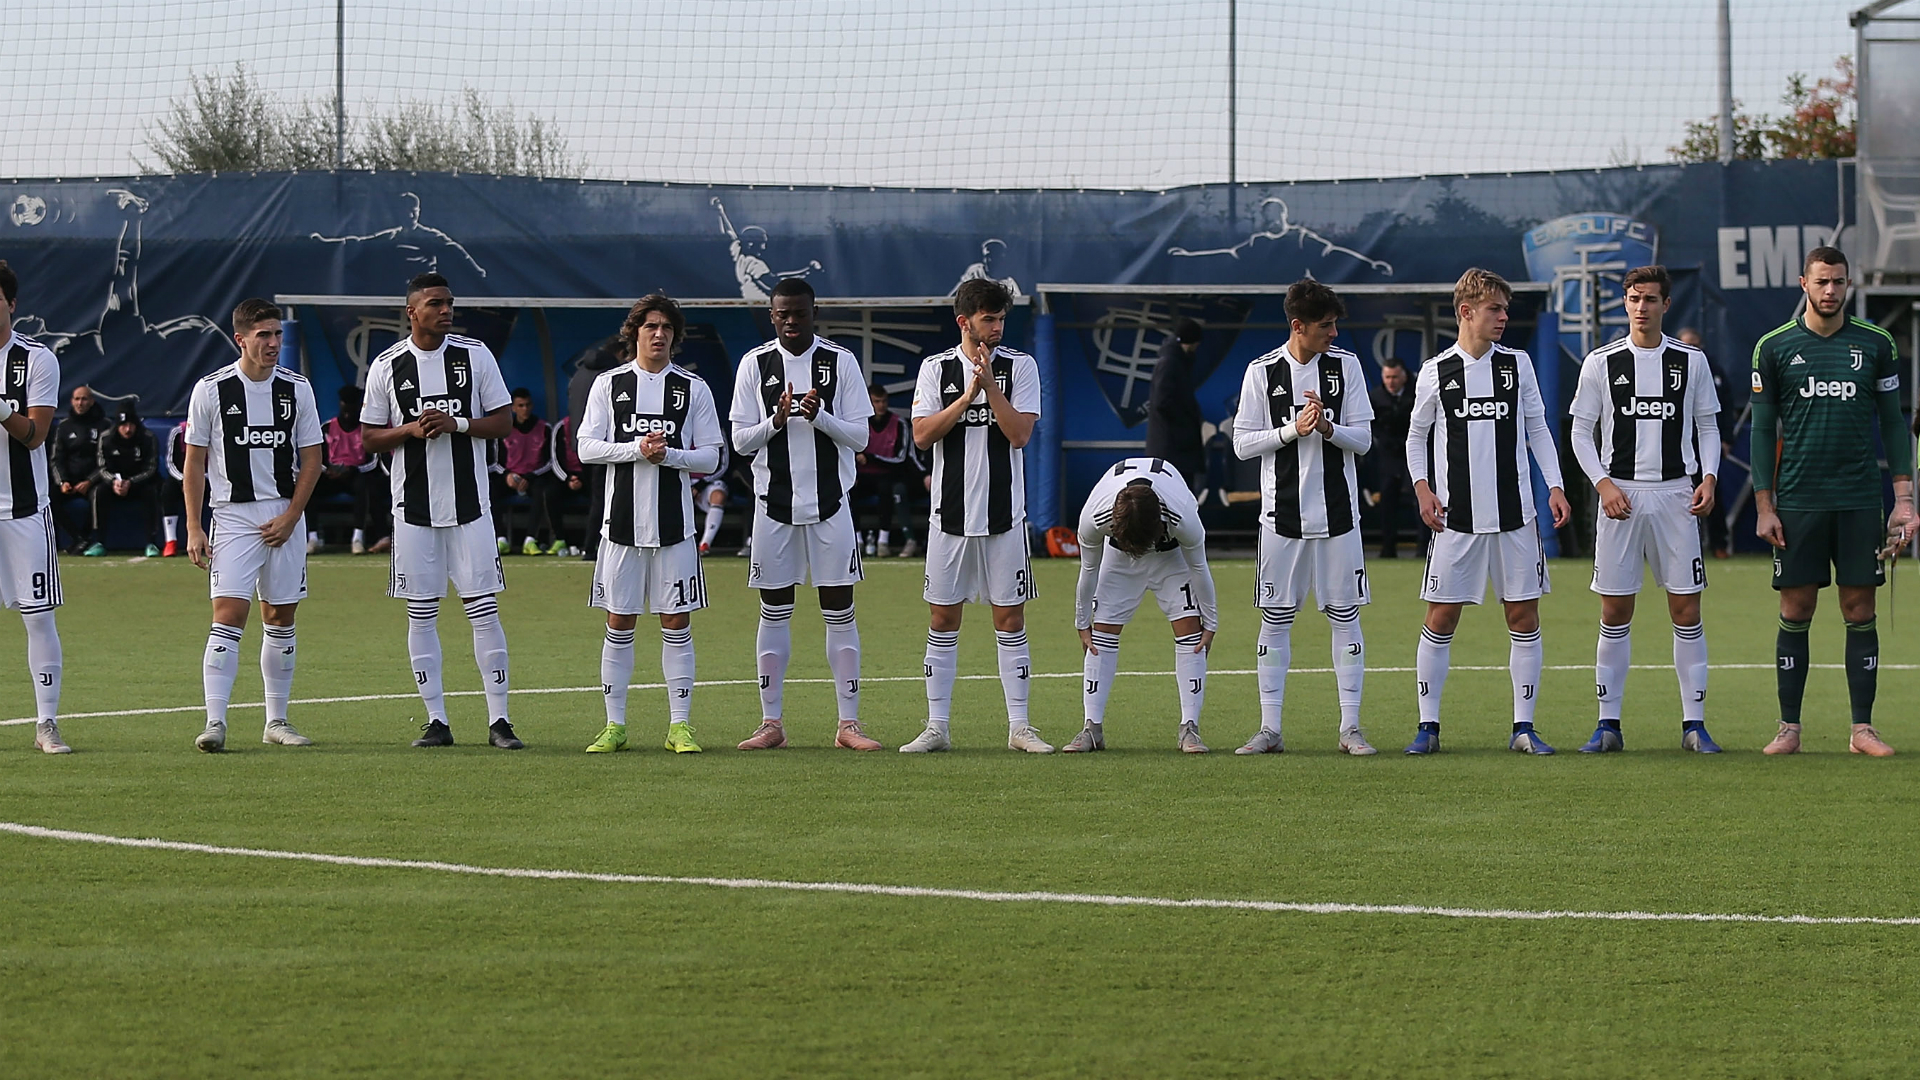 Alla Juventus la Coppa Italia Serie C: Ternana battuta 2-1